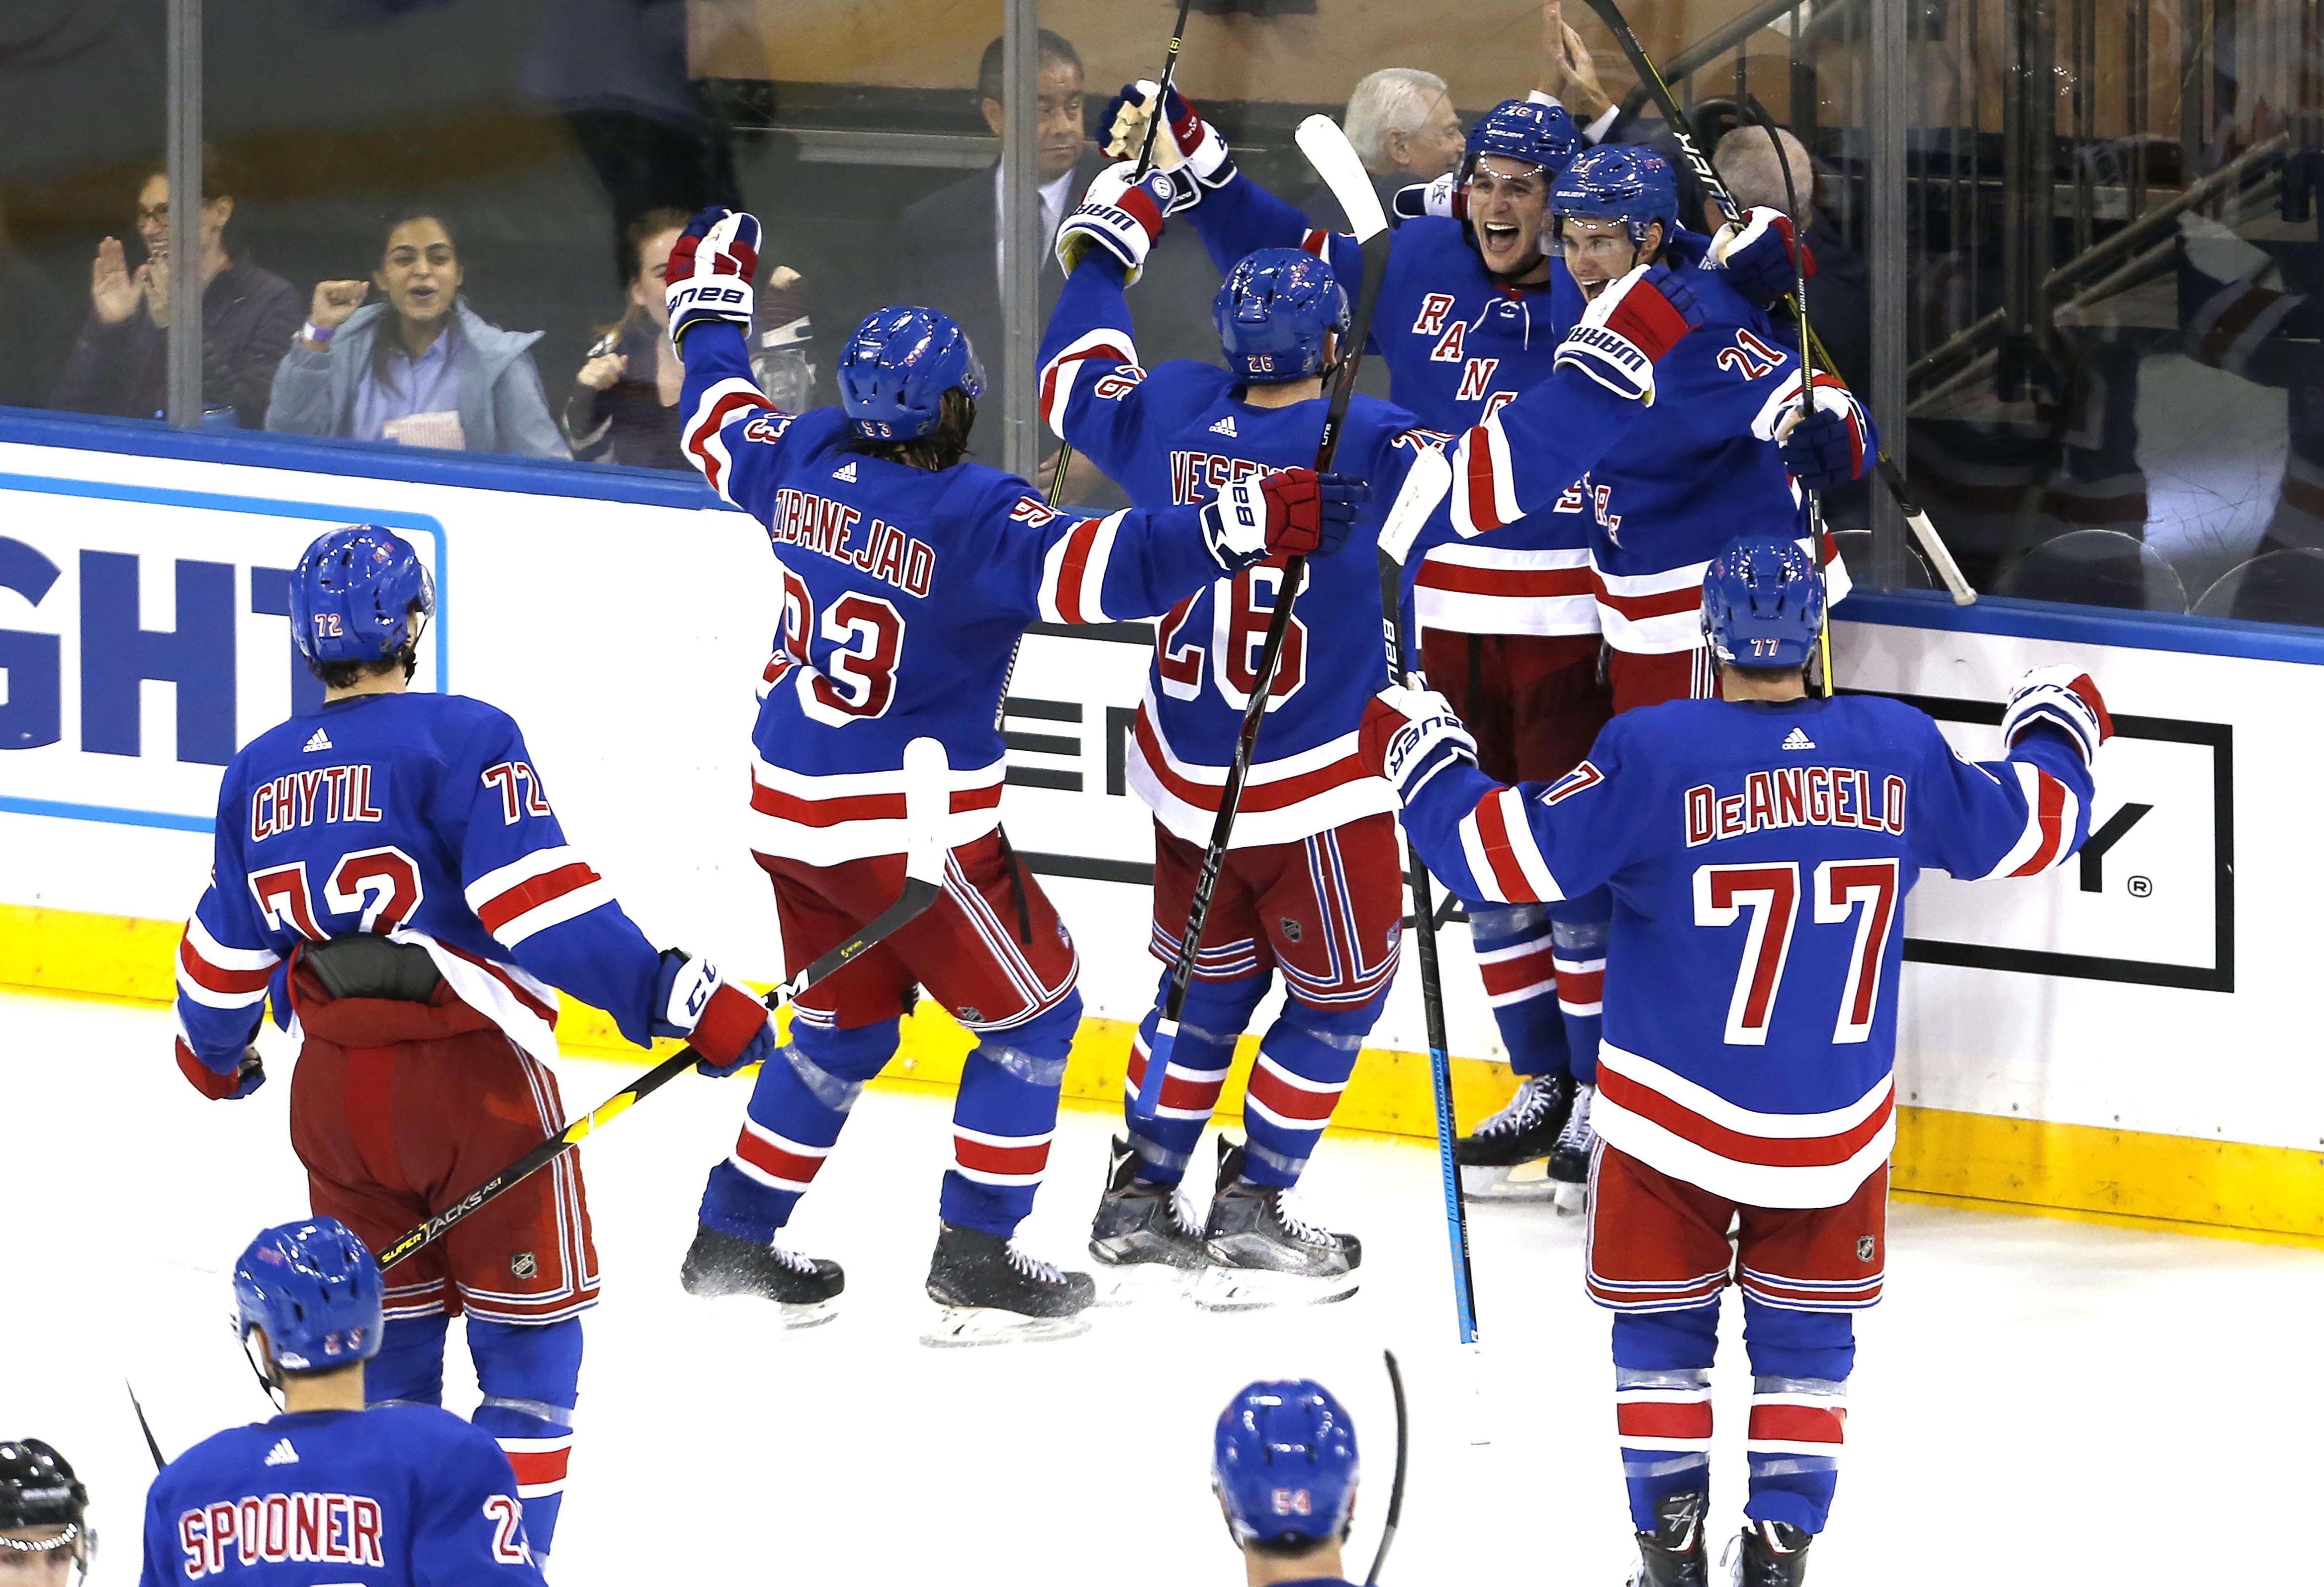 NHL: San Jose Sharks at New York Rangers